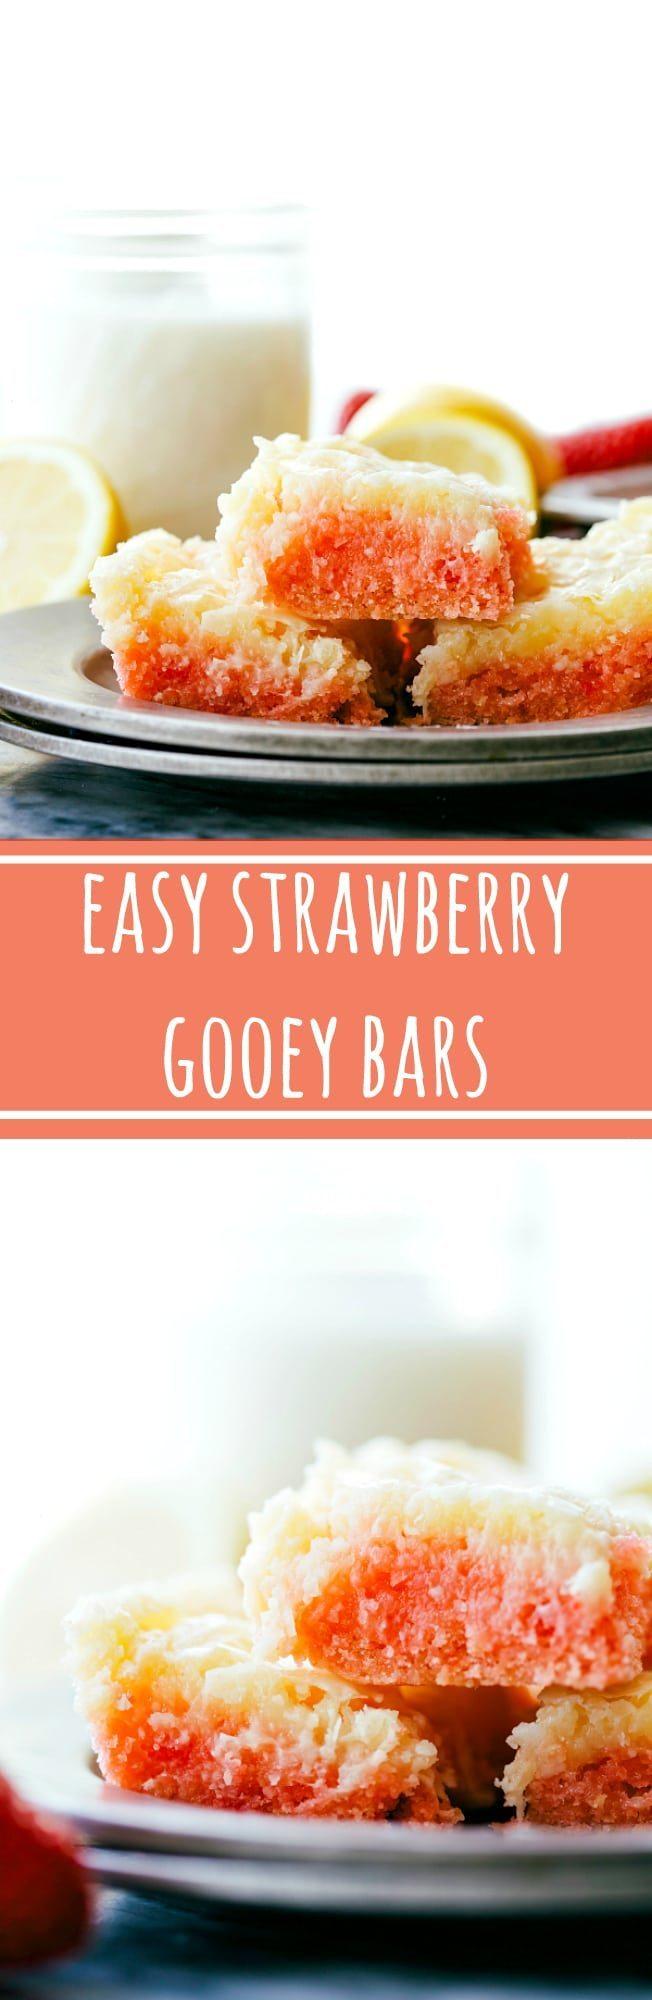 Delicious SIMPLE strawberry gooey cheesecake cake bars